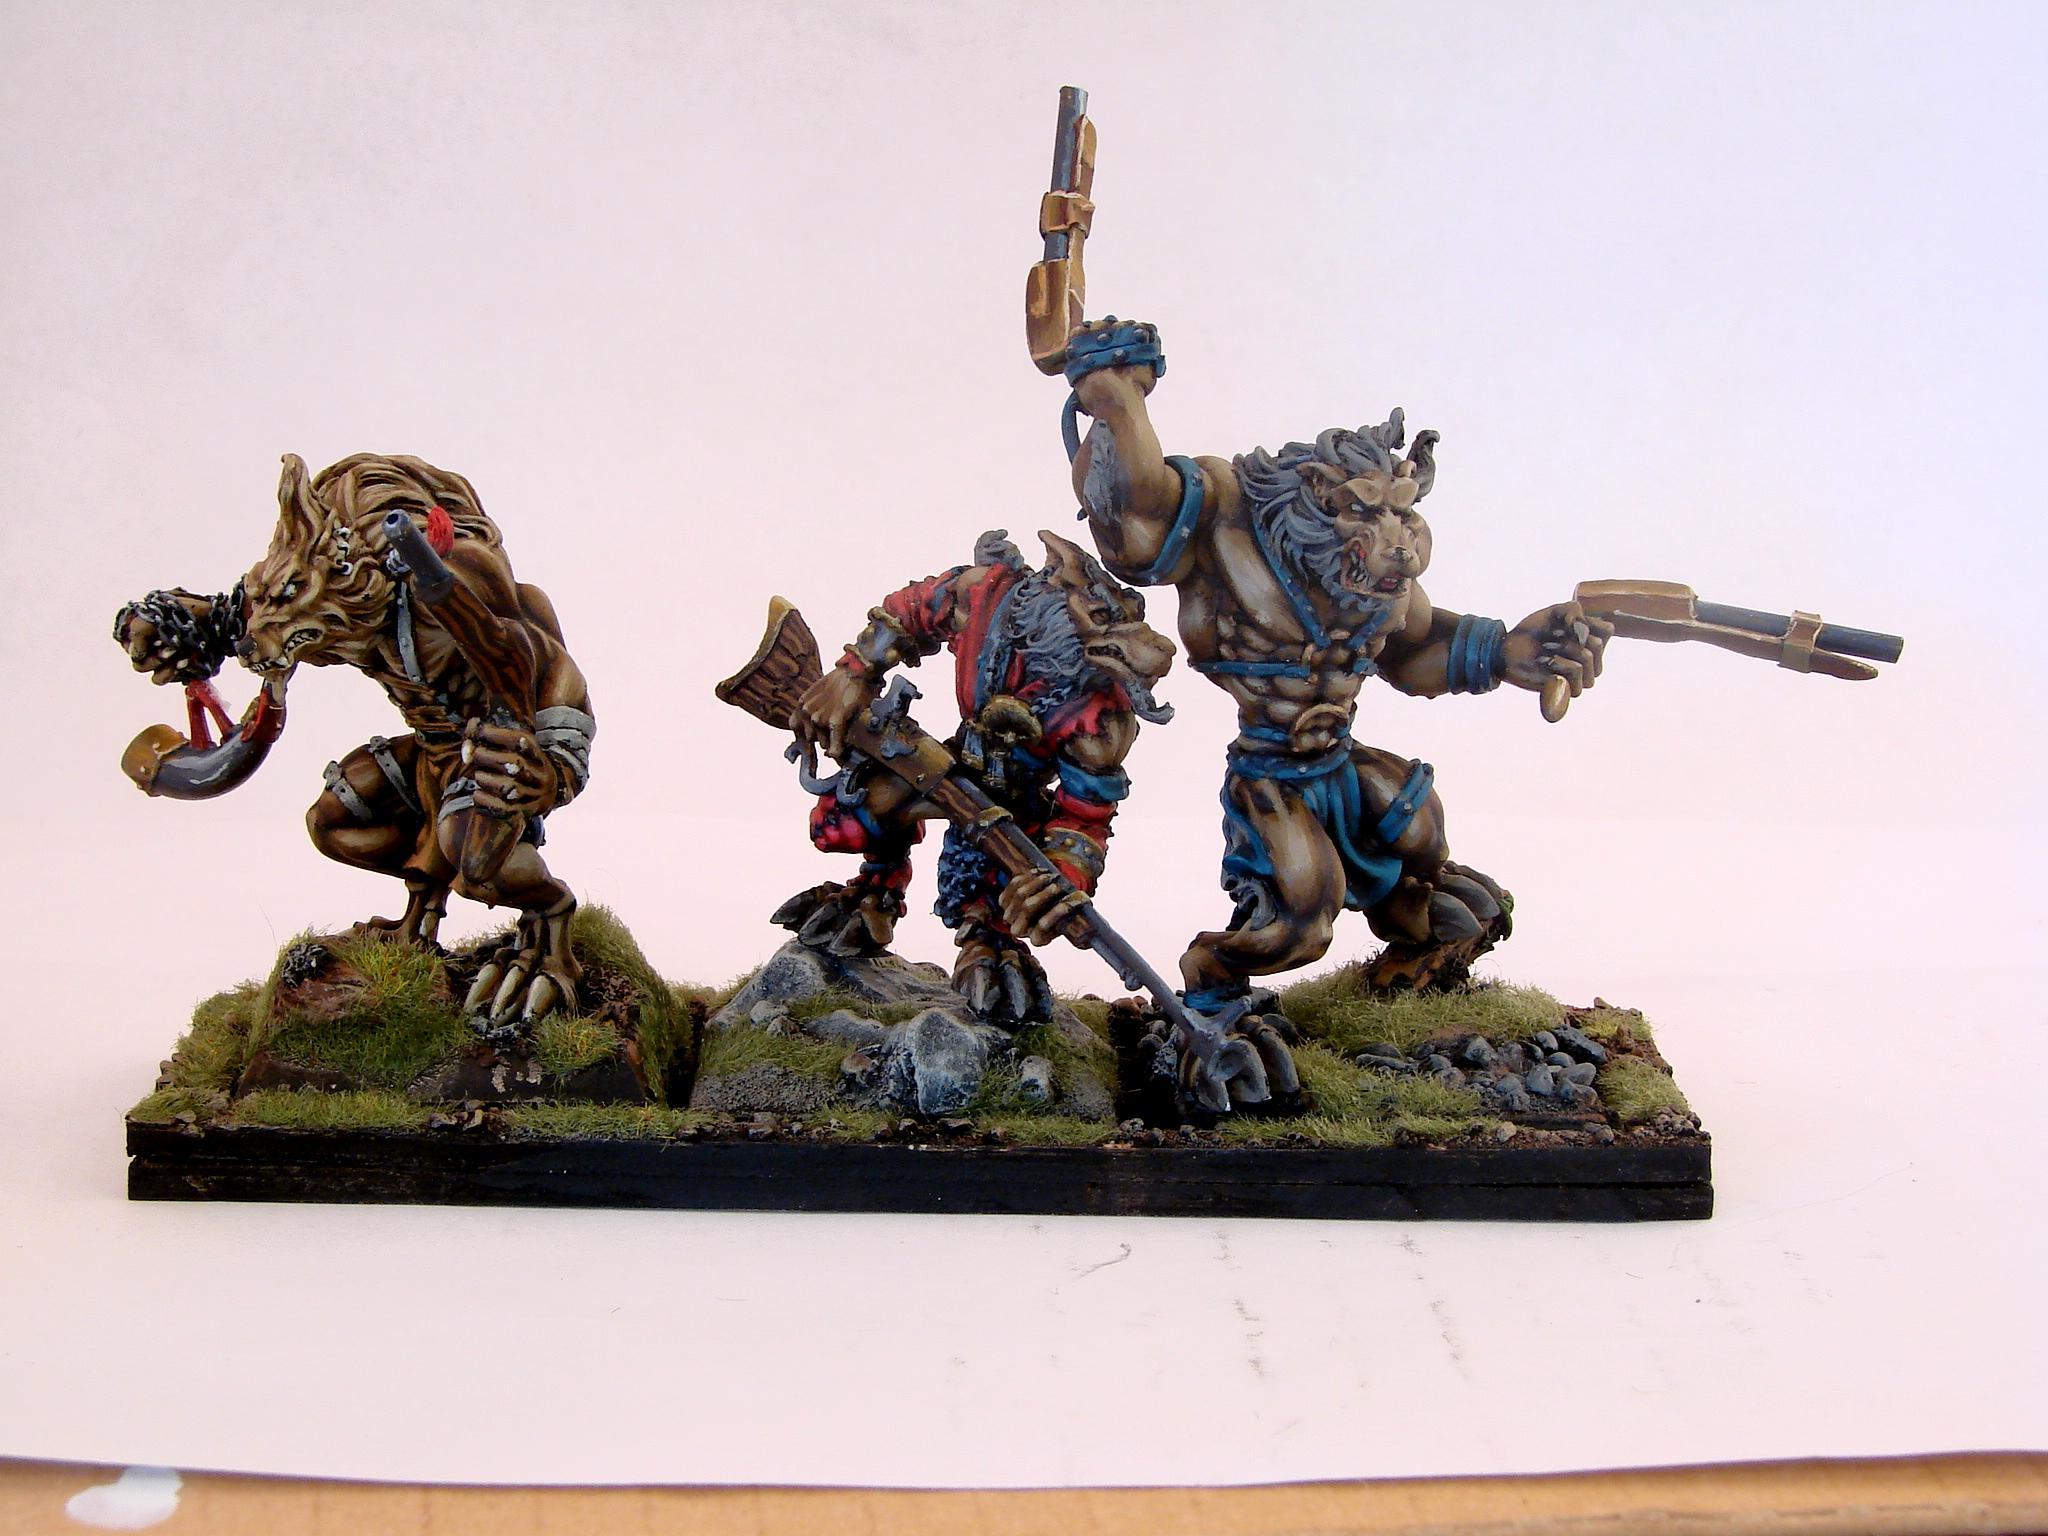 Maneaters, Non-Metallic Metal, Ogre Kingdoms, Rackham, Razormage